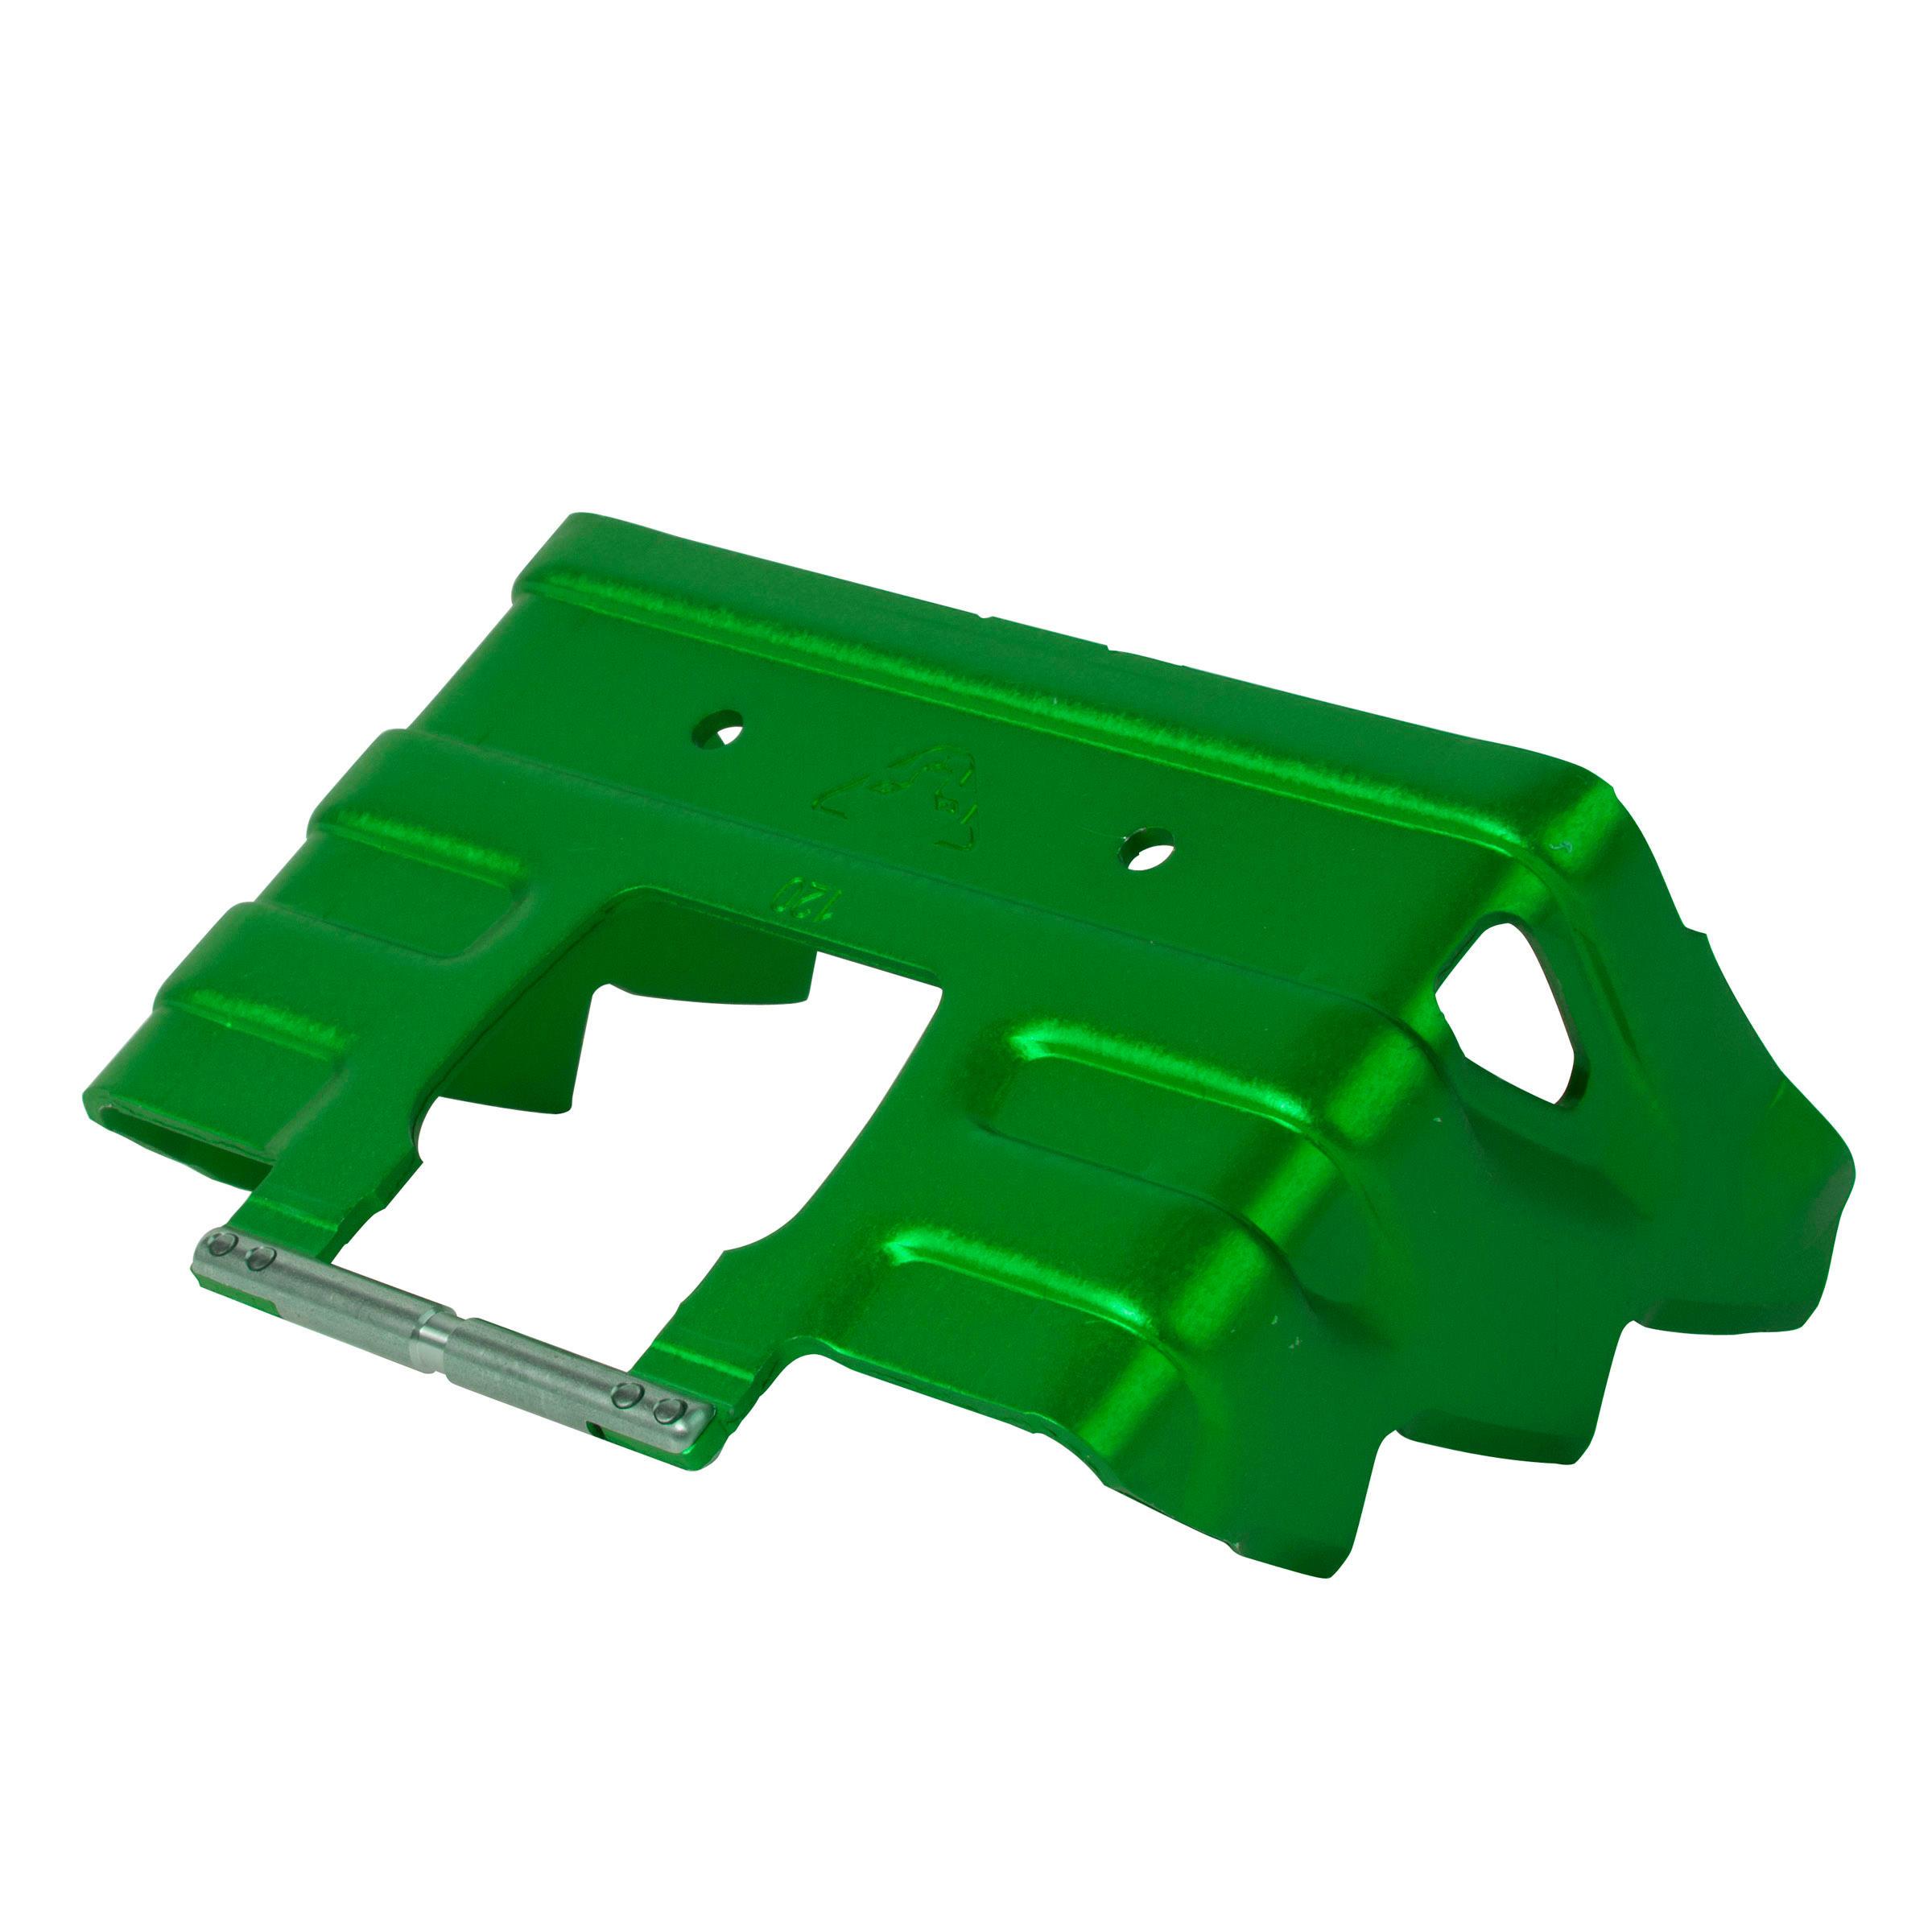 Dynafit Harschijzers 80 mm groen thumbnail